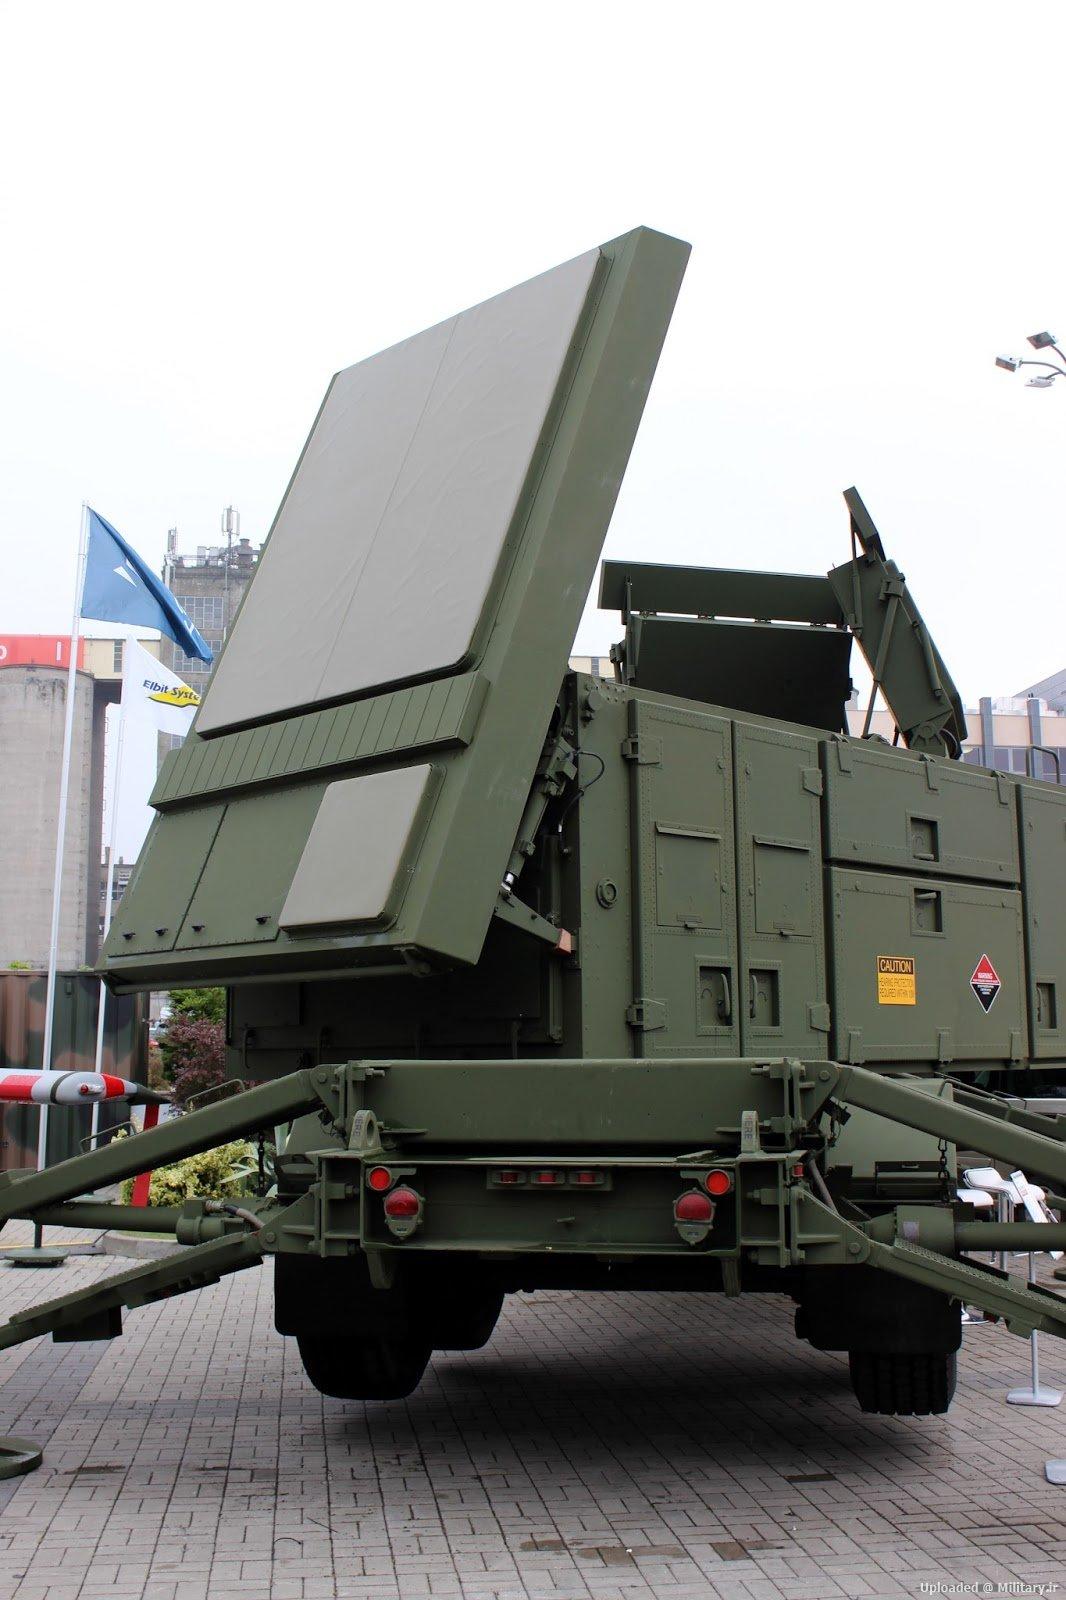 Raytheon_360_AESA_Gan_radar_for_Patriot.